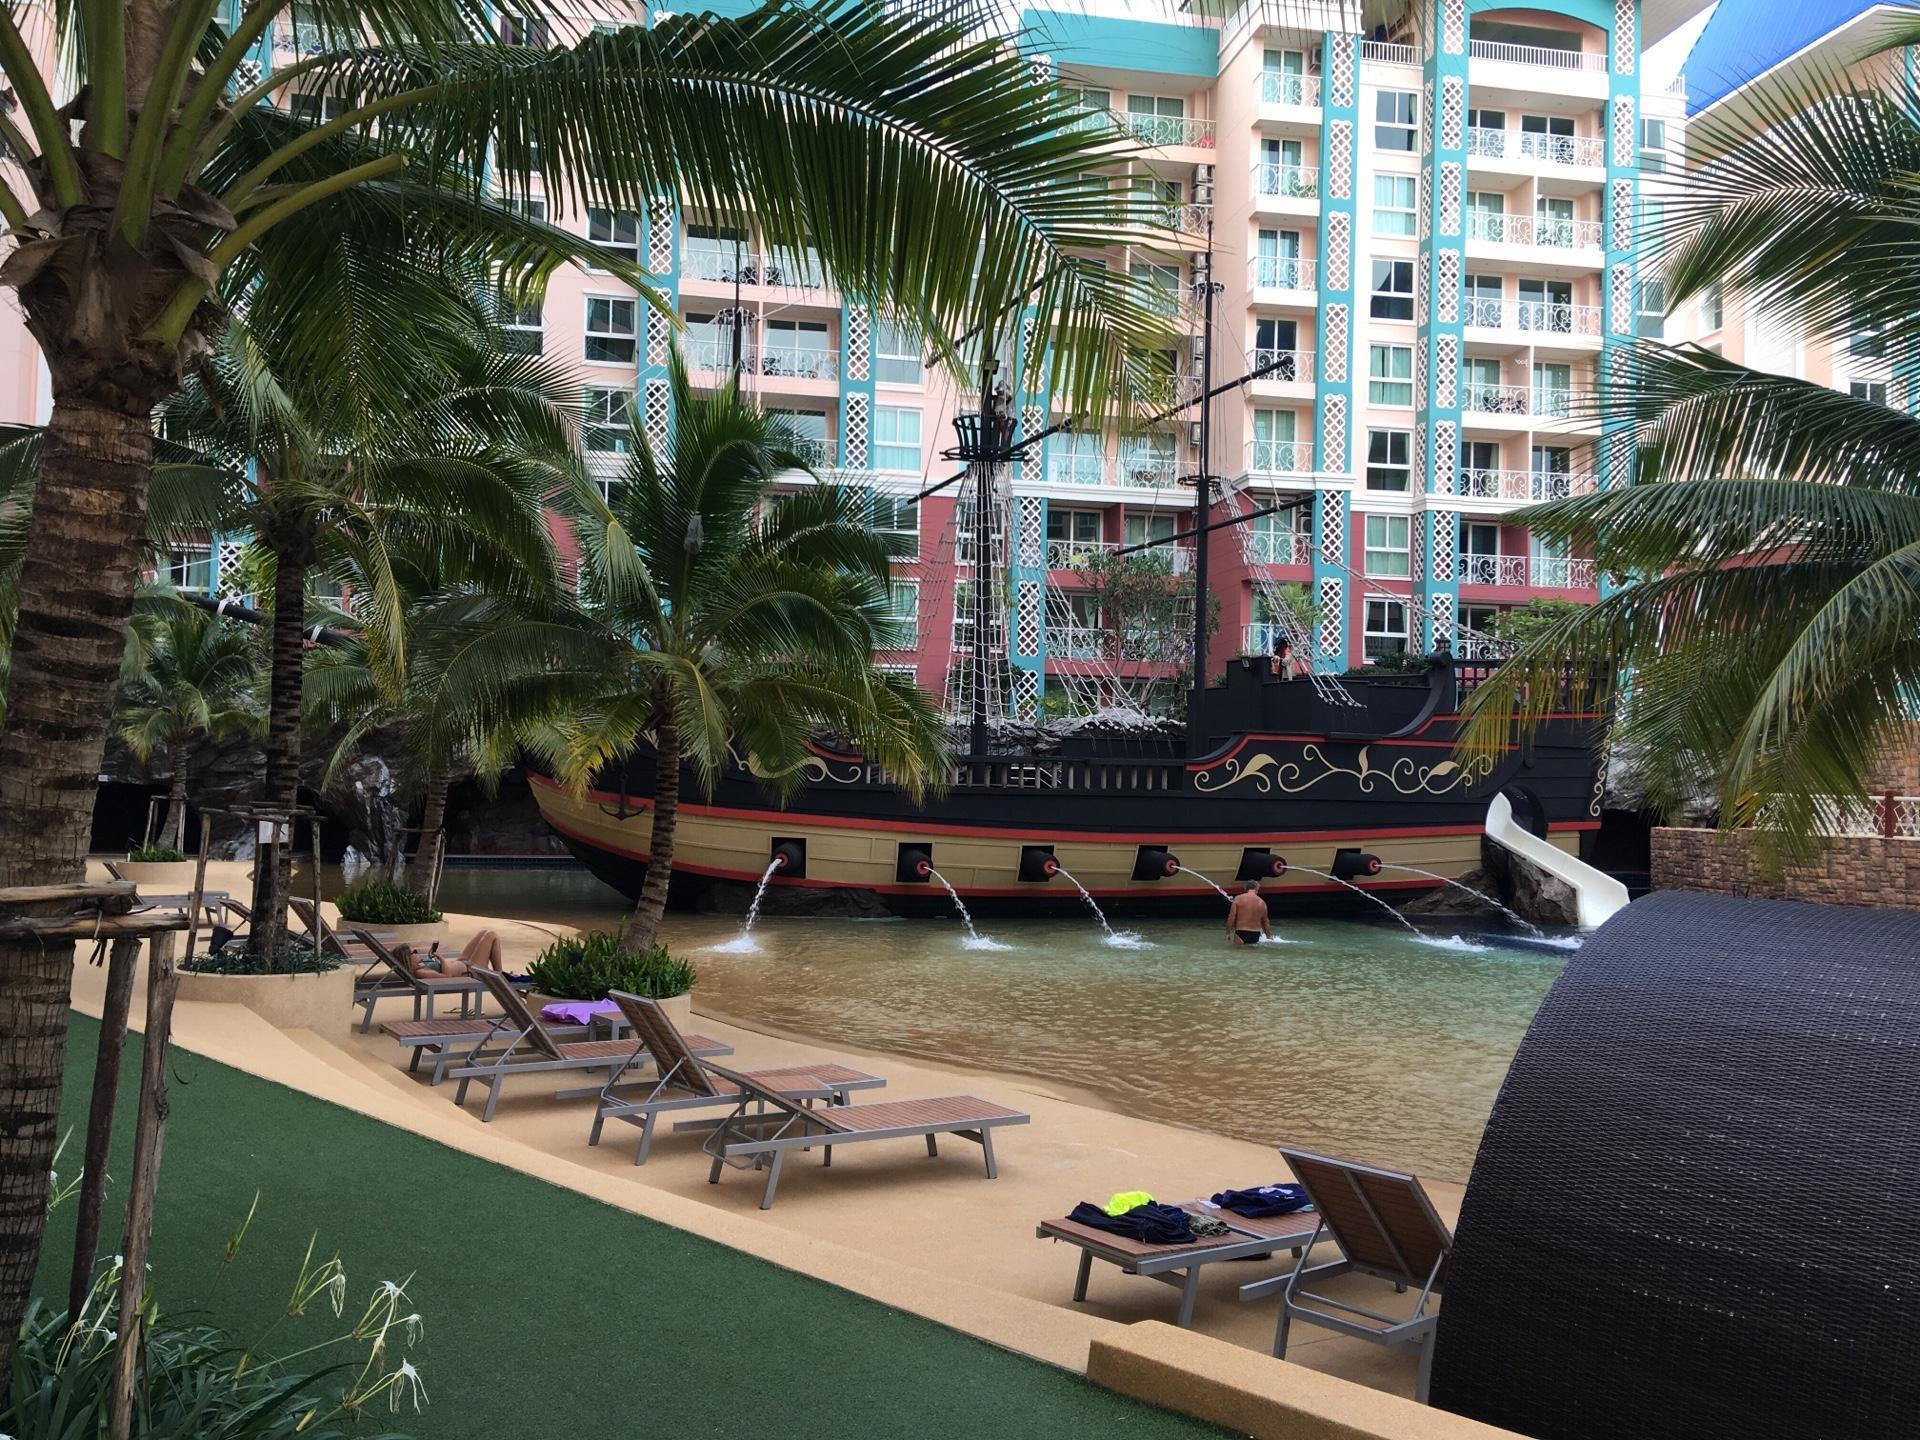 Grande Caribbean Condo Resort, Living Experience อพาร์ตเมนต์ 1 ห้องนอน 1 ห้องน้ำส่วนตัว ขนาด 40 ตร.ม. – เขาพระตำหนัก